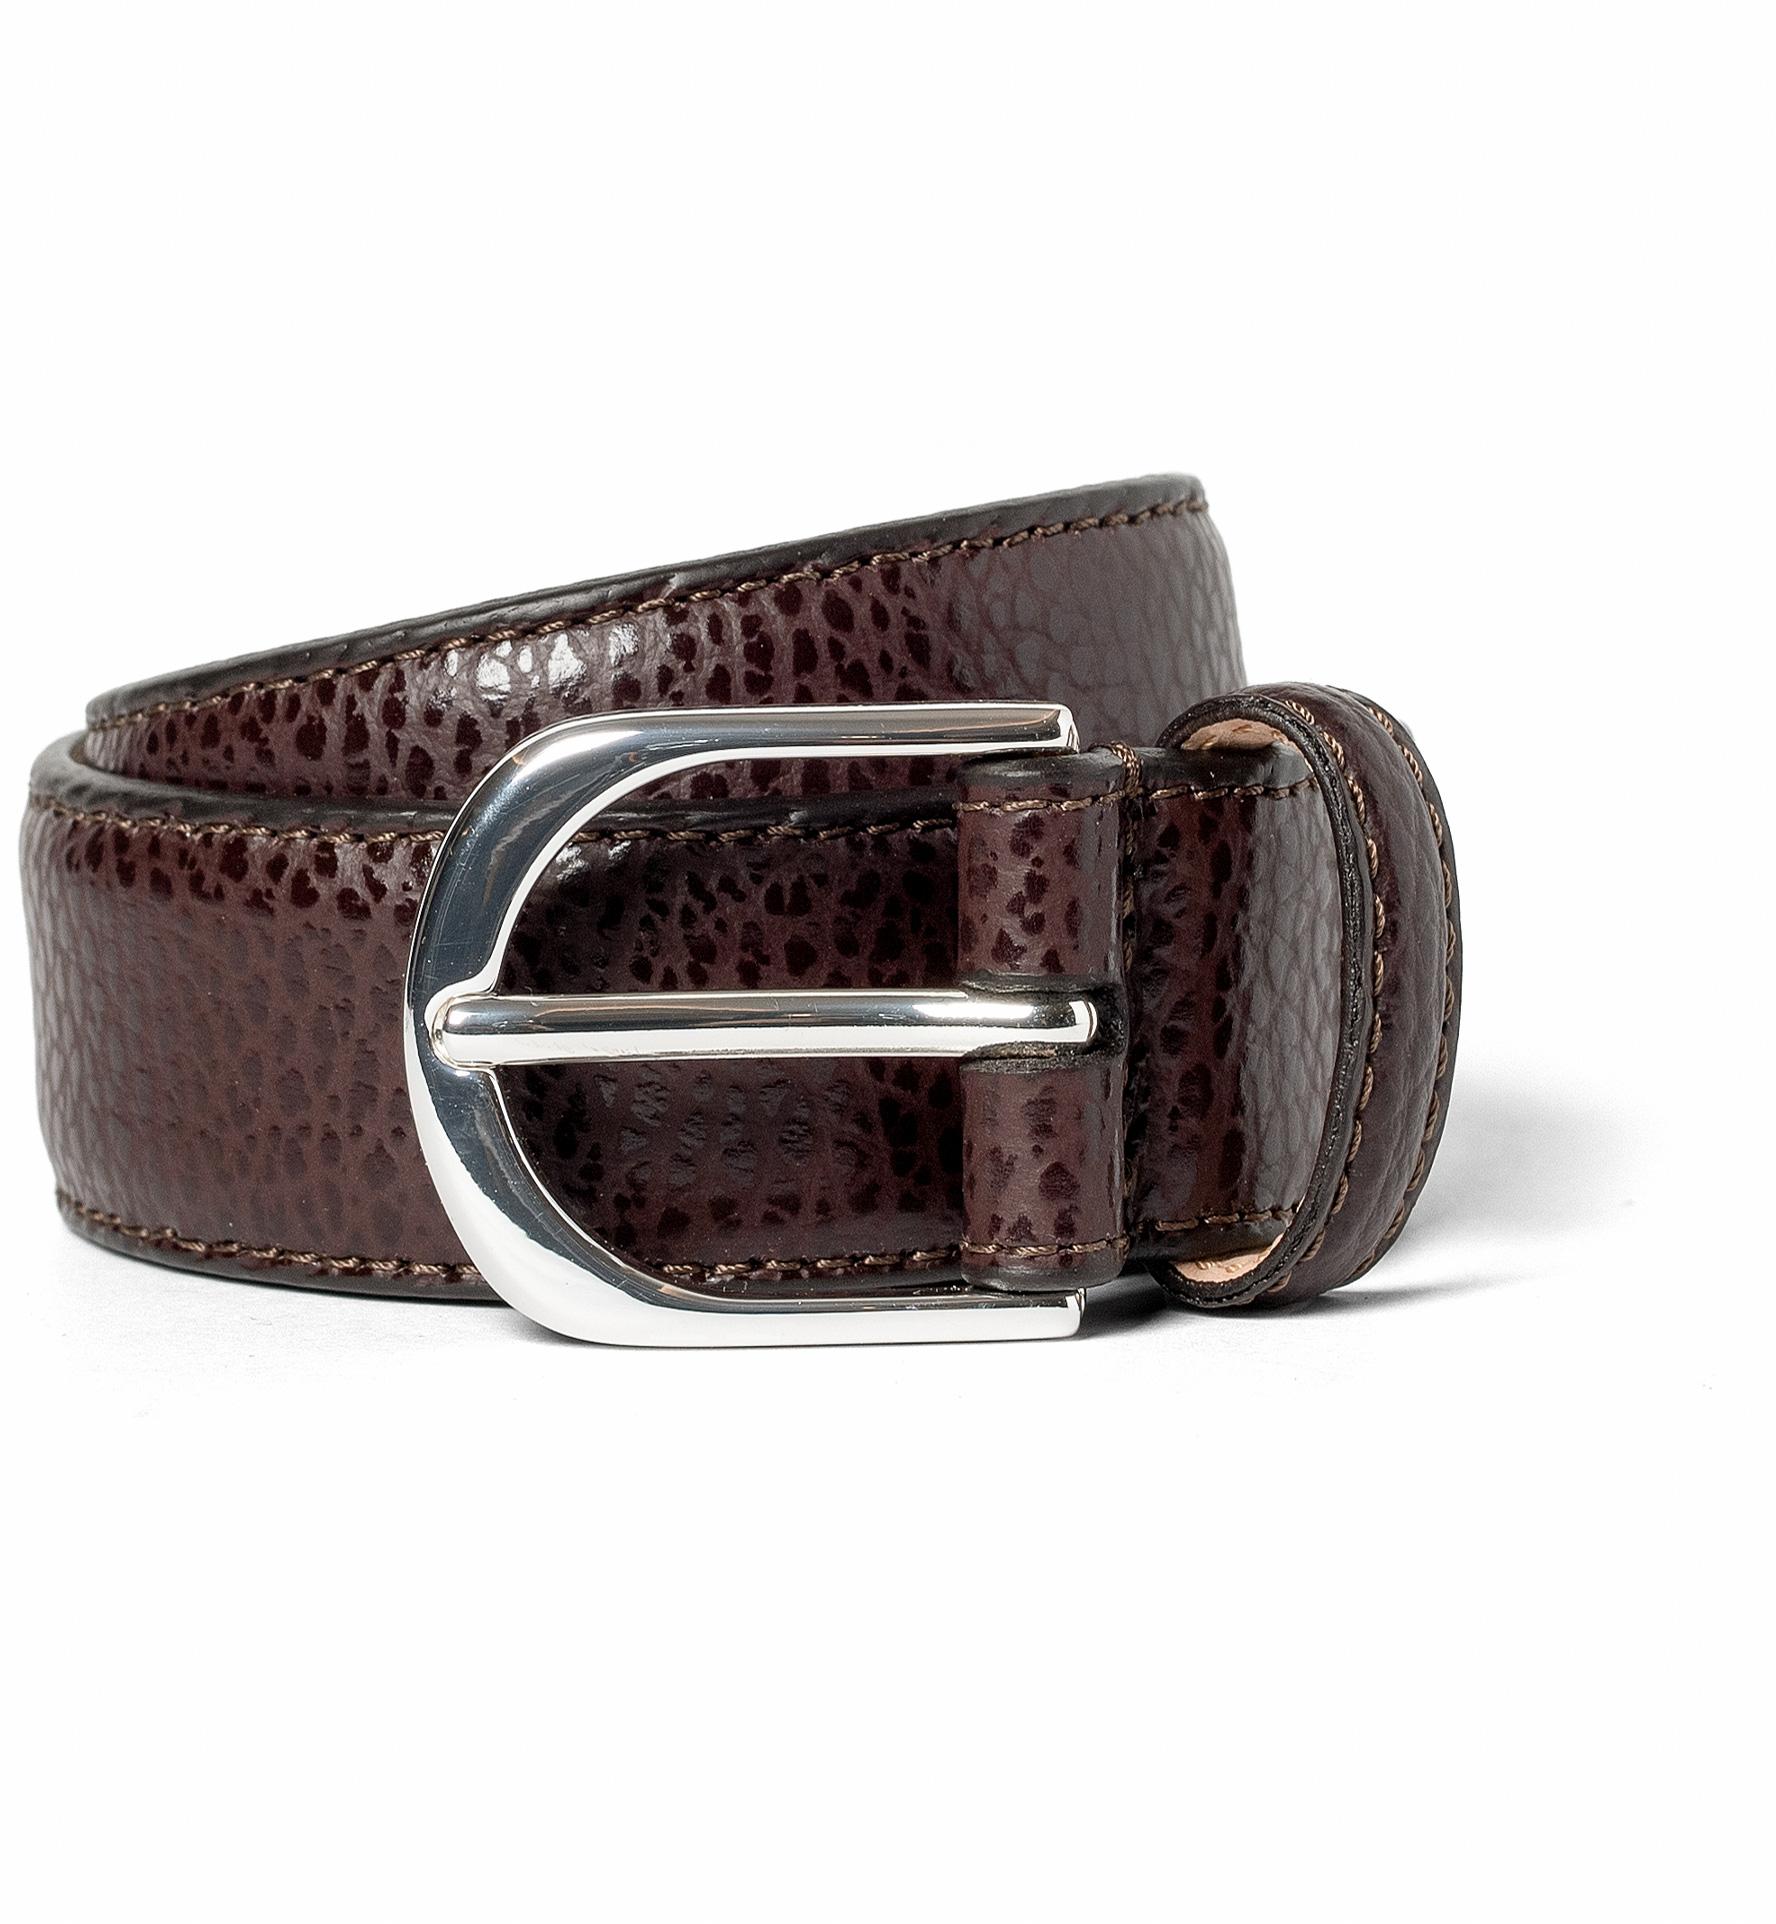 Zoom Image of Dark Brown Pebbled Leather Belt